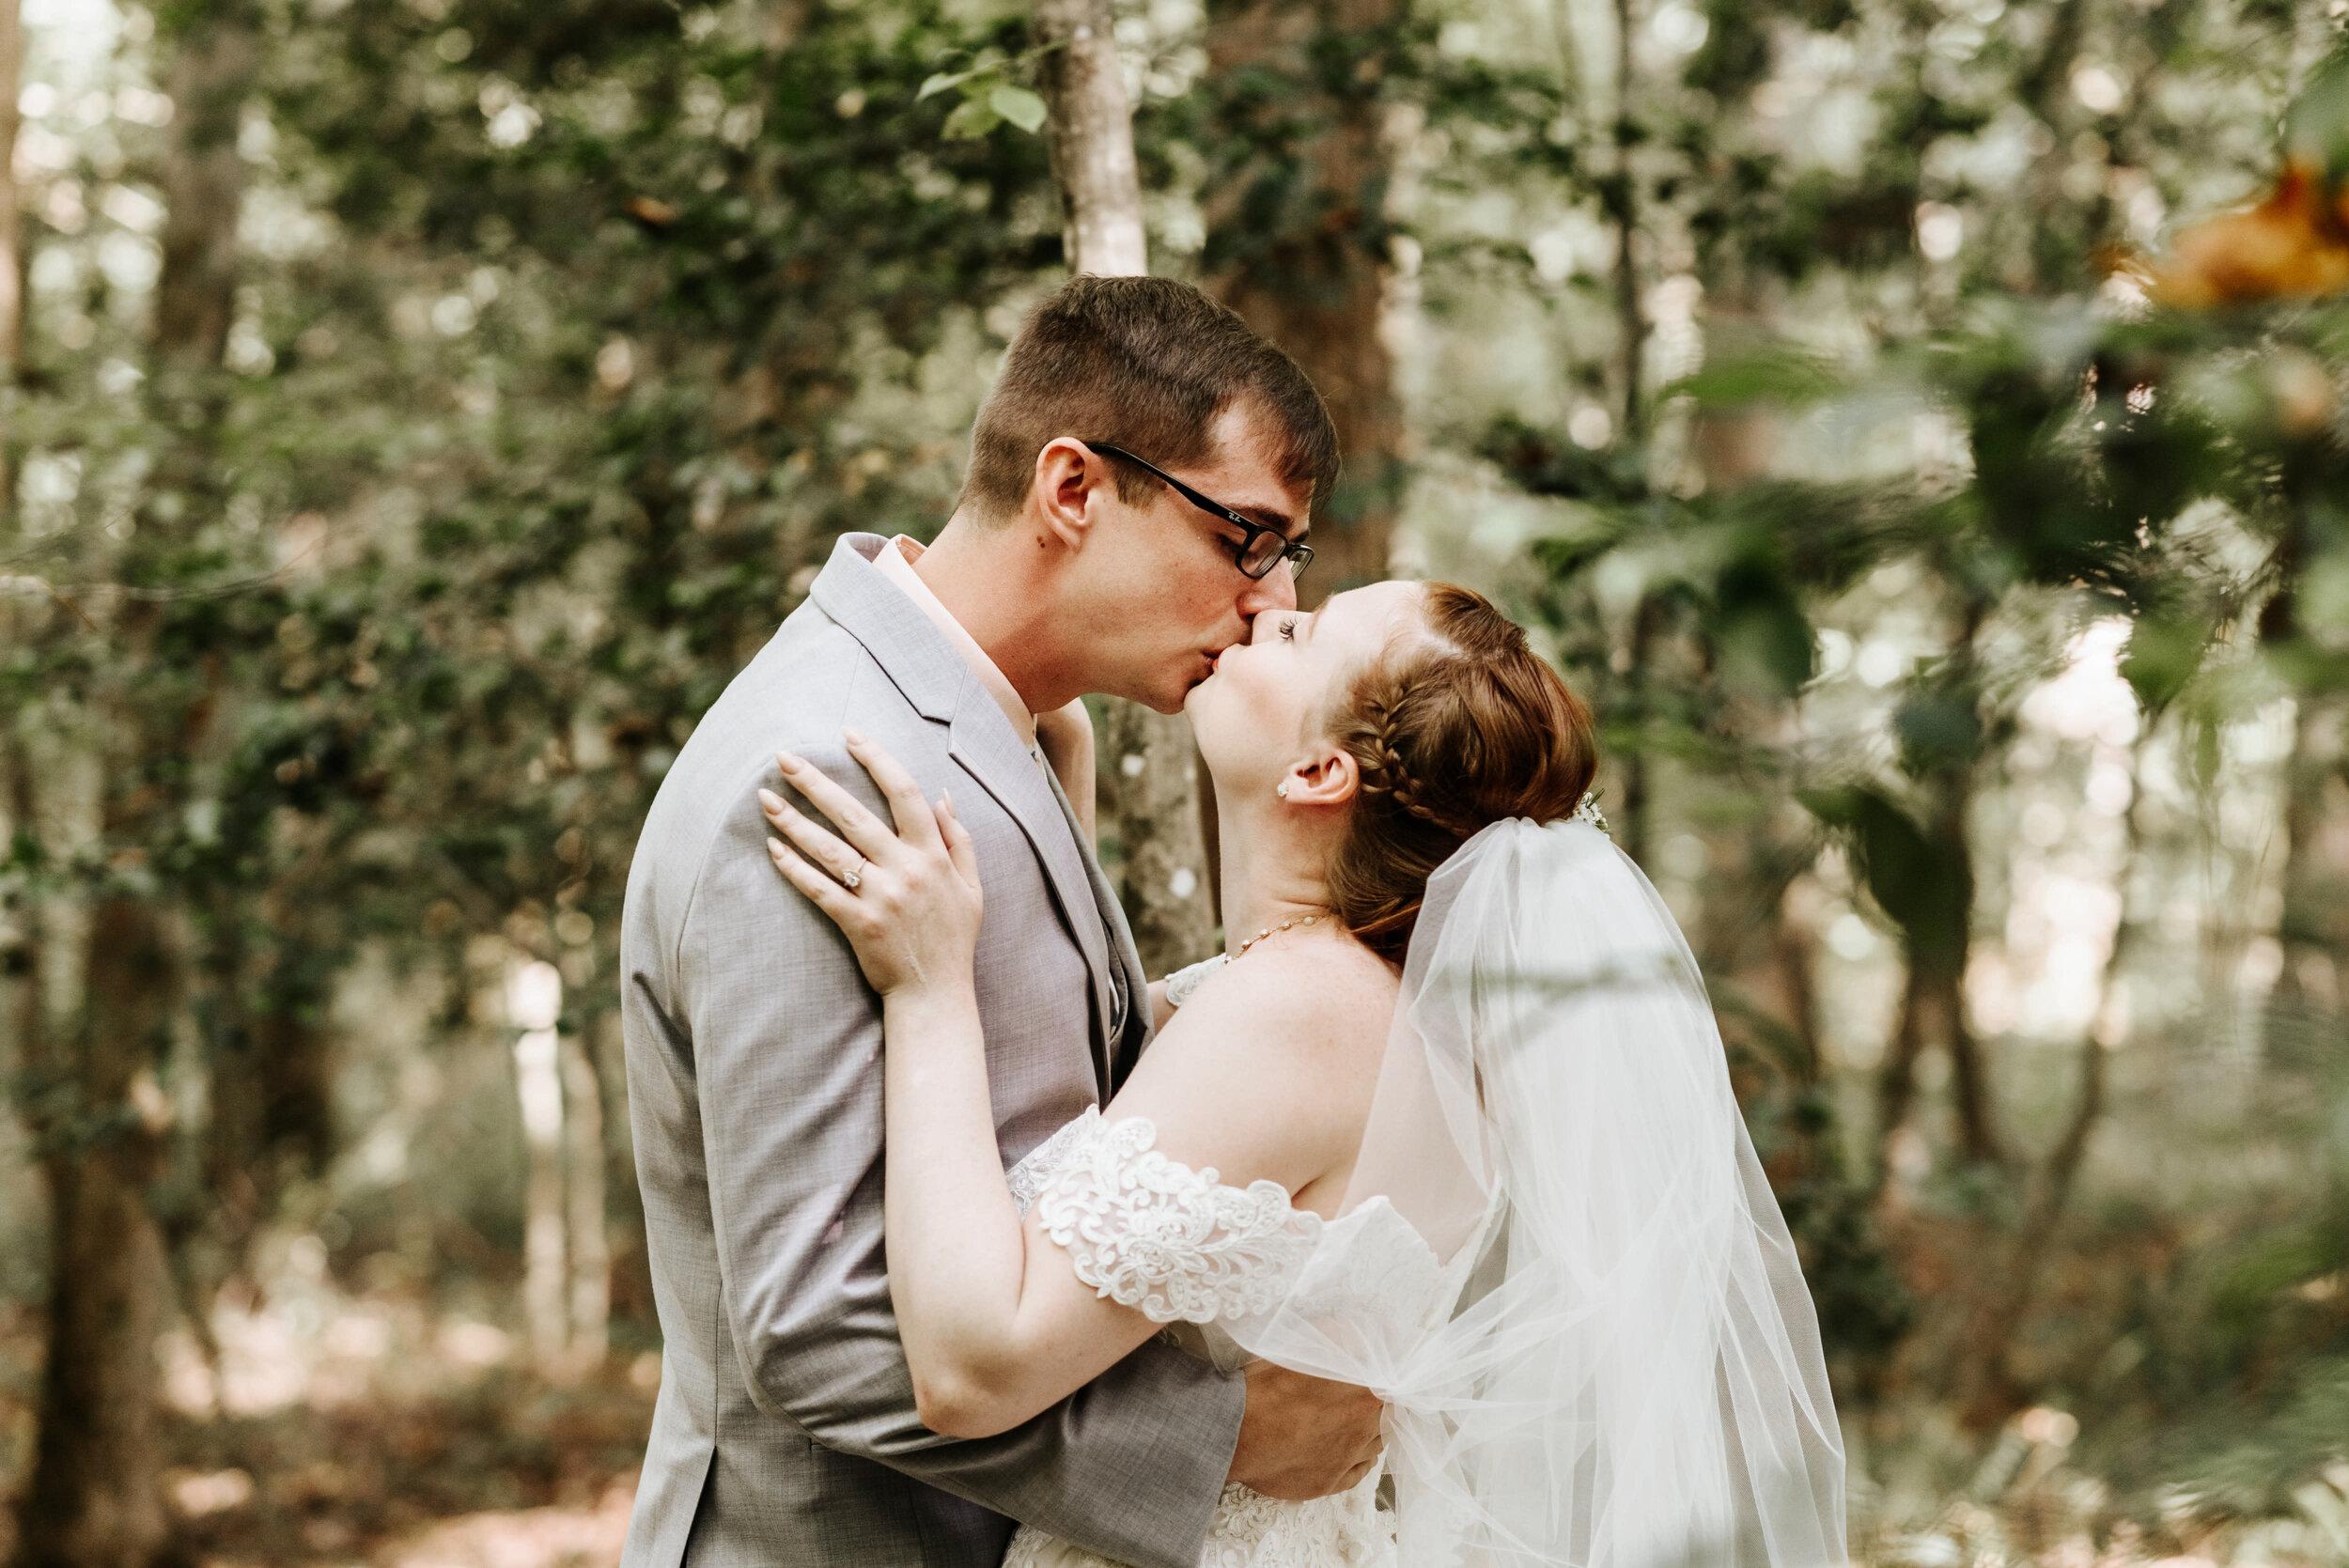 Rachel_David_Wedding_Richmond_Virginia_Photography_by_V_17.jpg